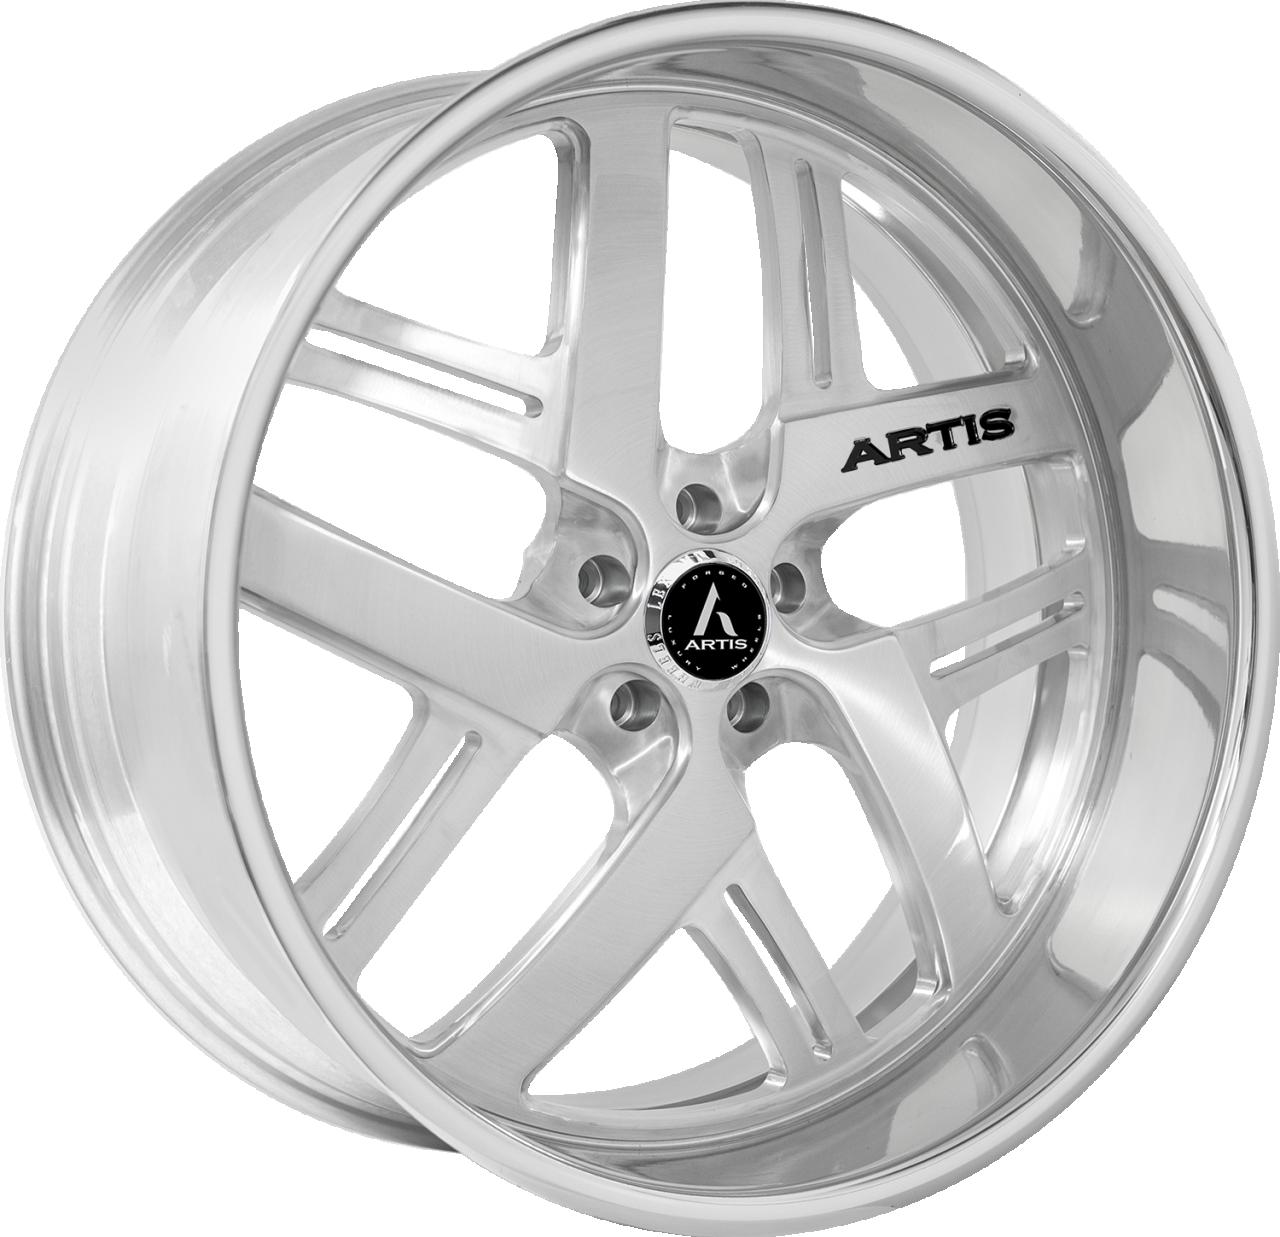 Artis Forged Bomber-M wheel with Brushed finish